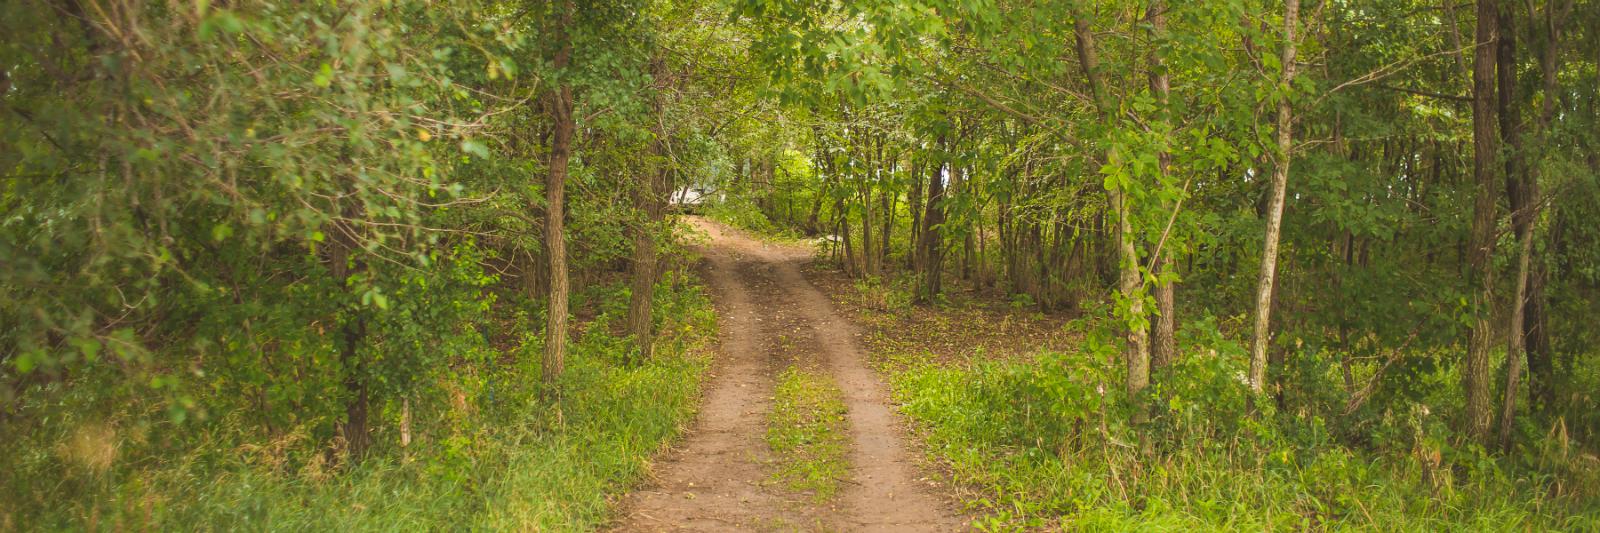 ttf-path.jpg